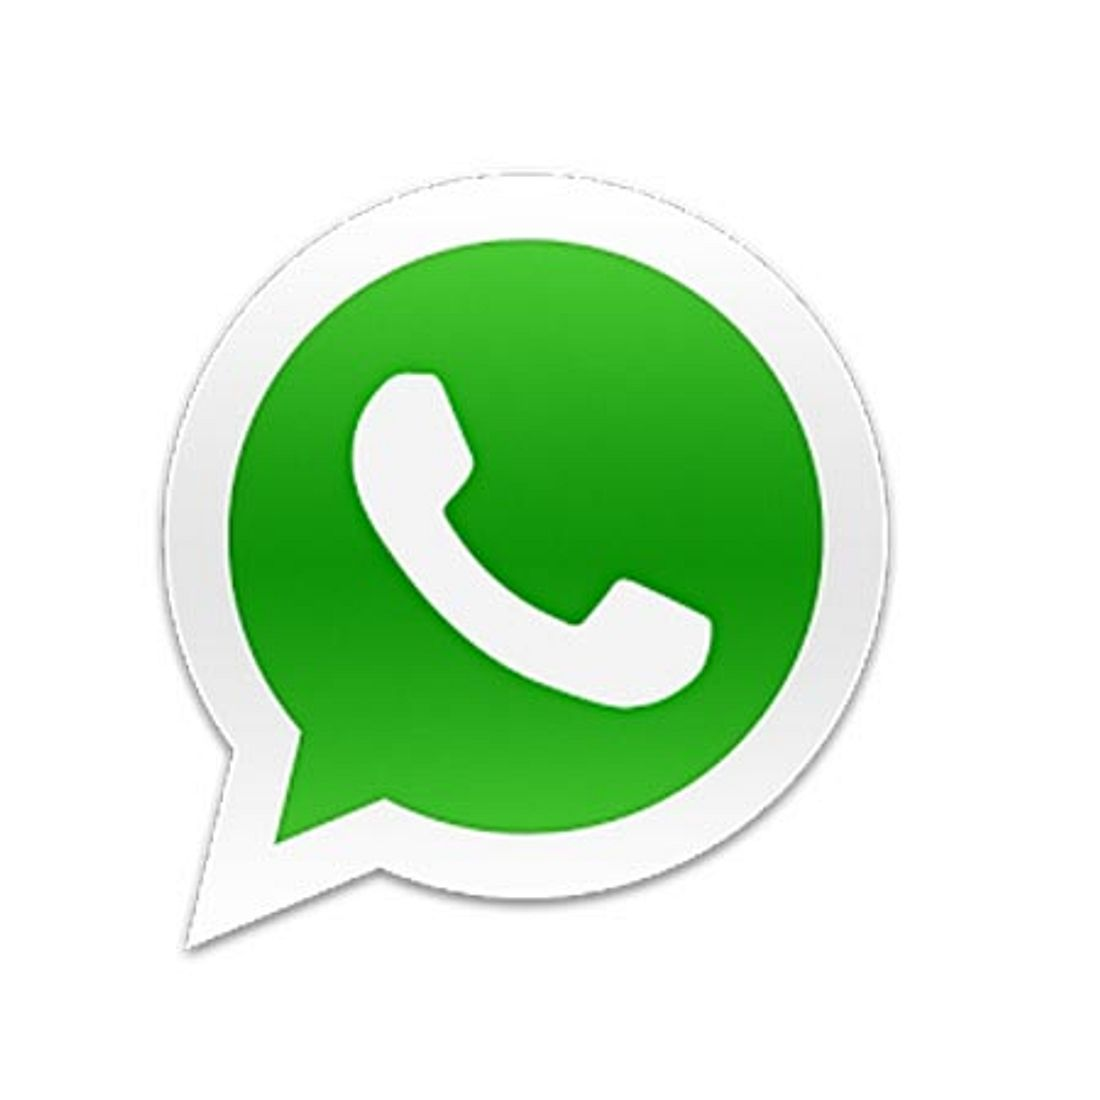 15 coole WhatsApp-Sprüche! Teil 2